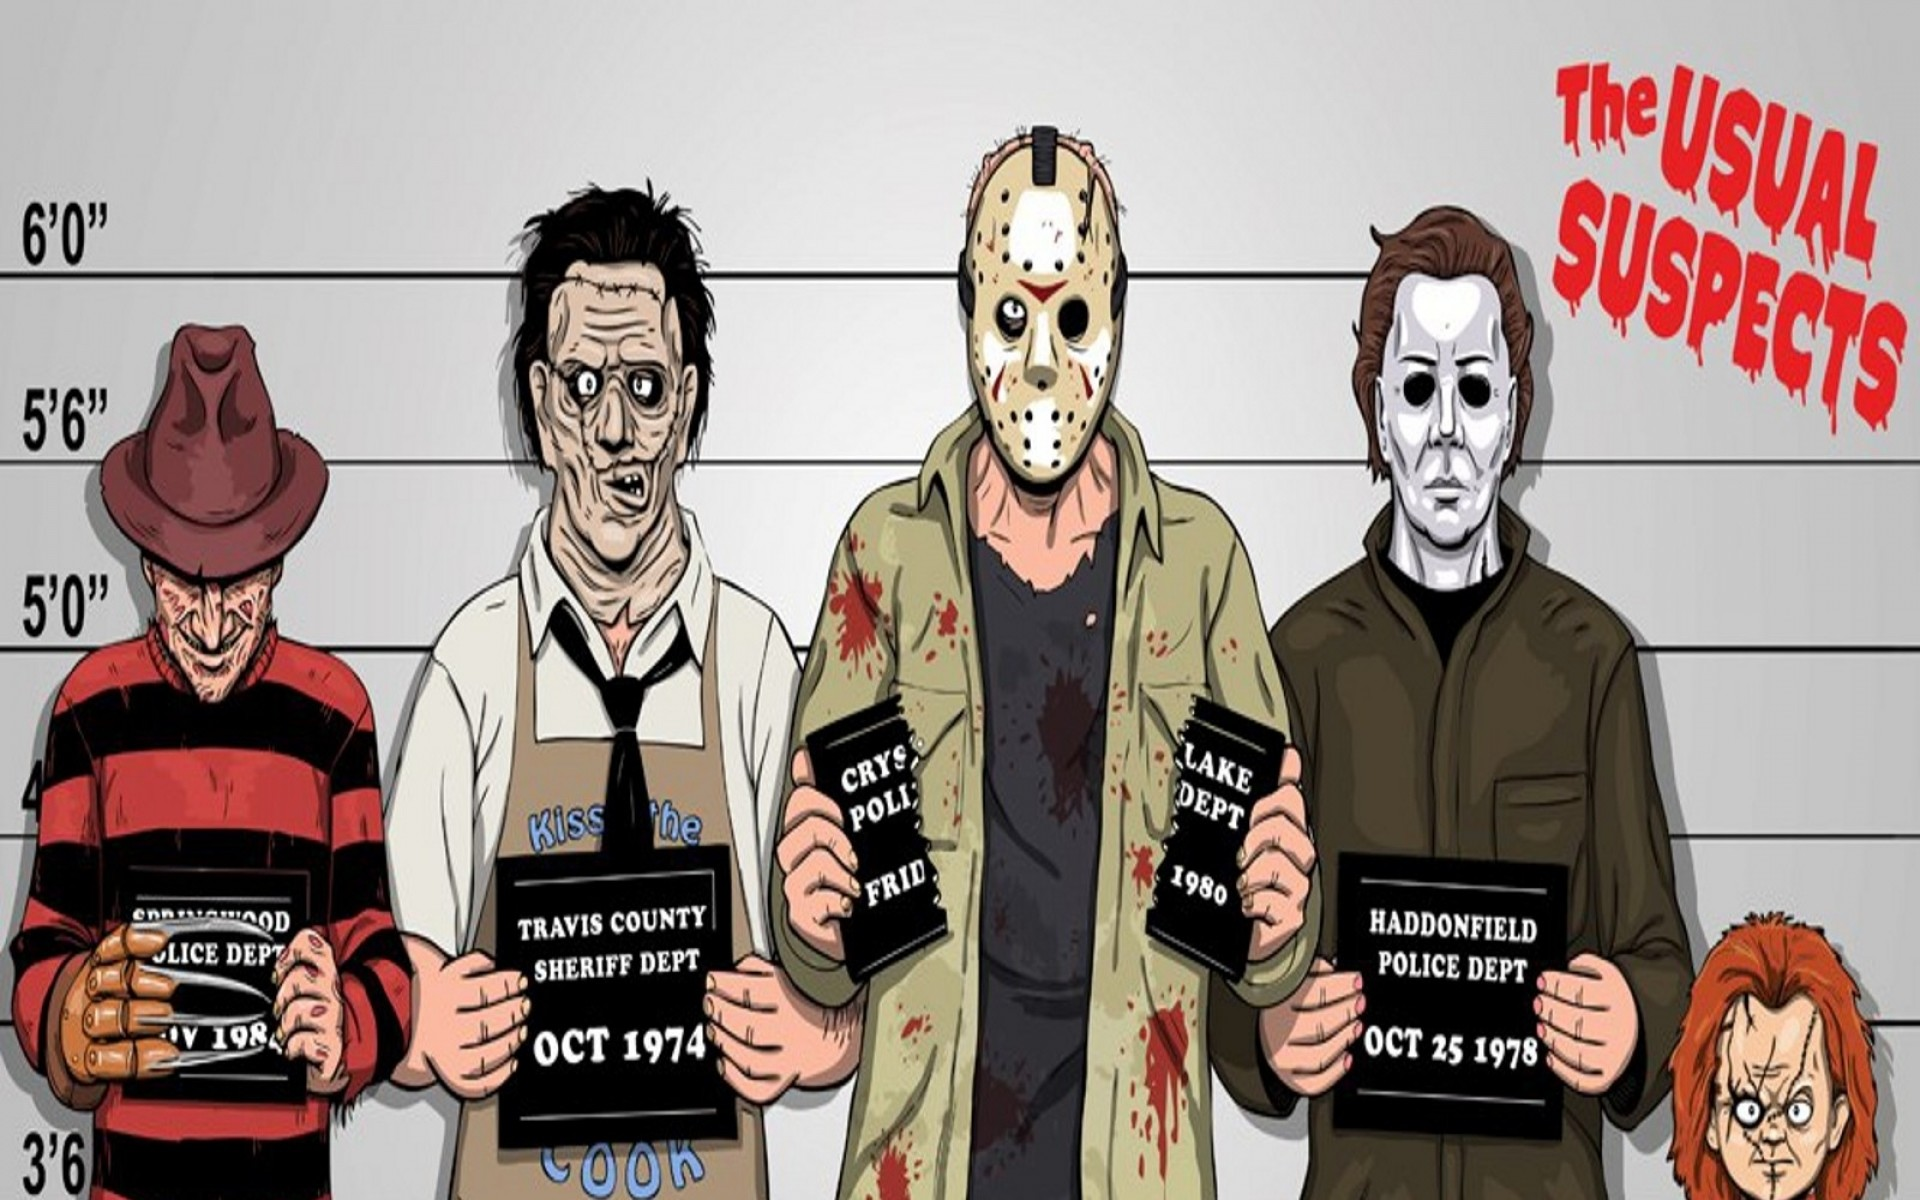 2560x1600 Horror Movies Rain Jason Friday The 13th Voorhees 1400x911 Wallpaper Art HD